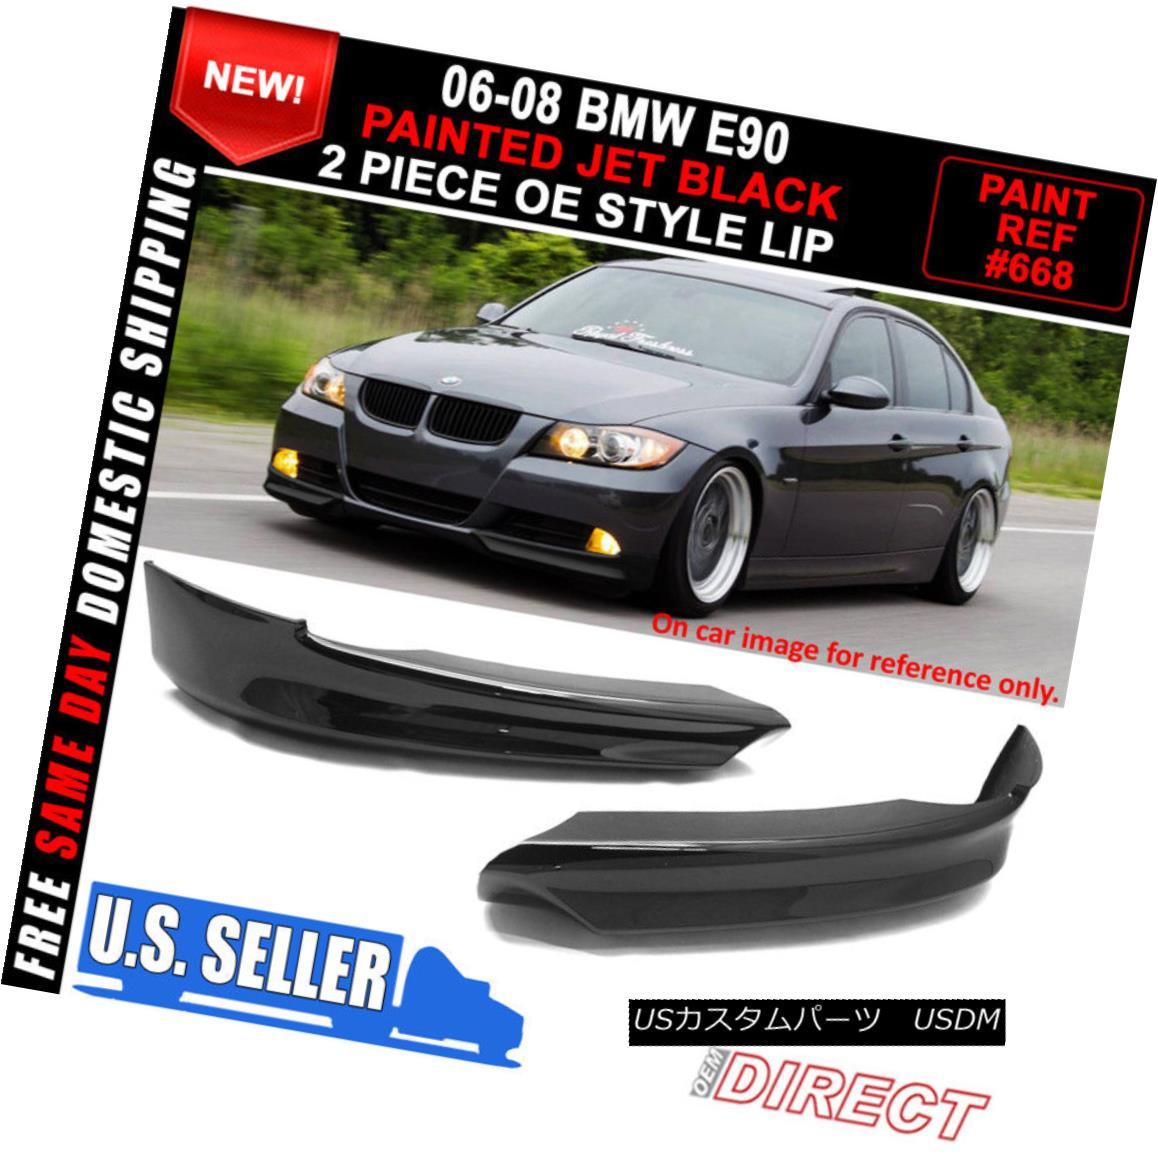 Pair 06-08 BMW 3 Series E90 Black Front Splitter Lip OE Style Unpainted ABS